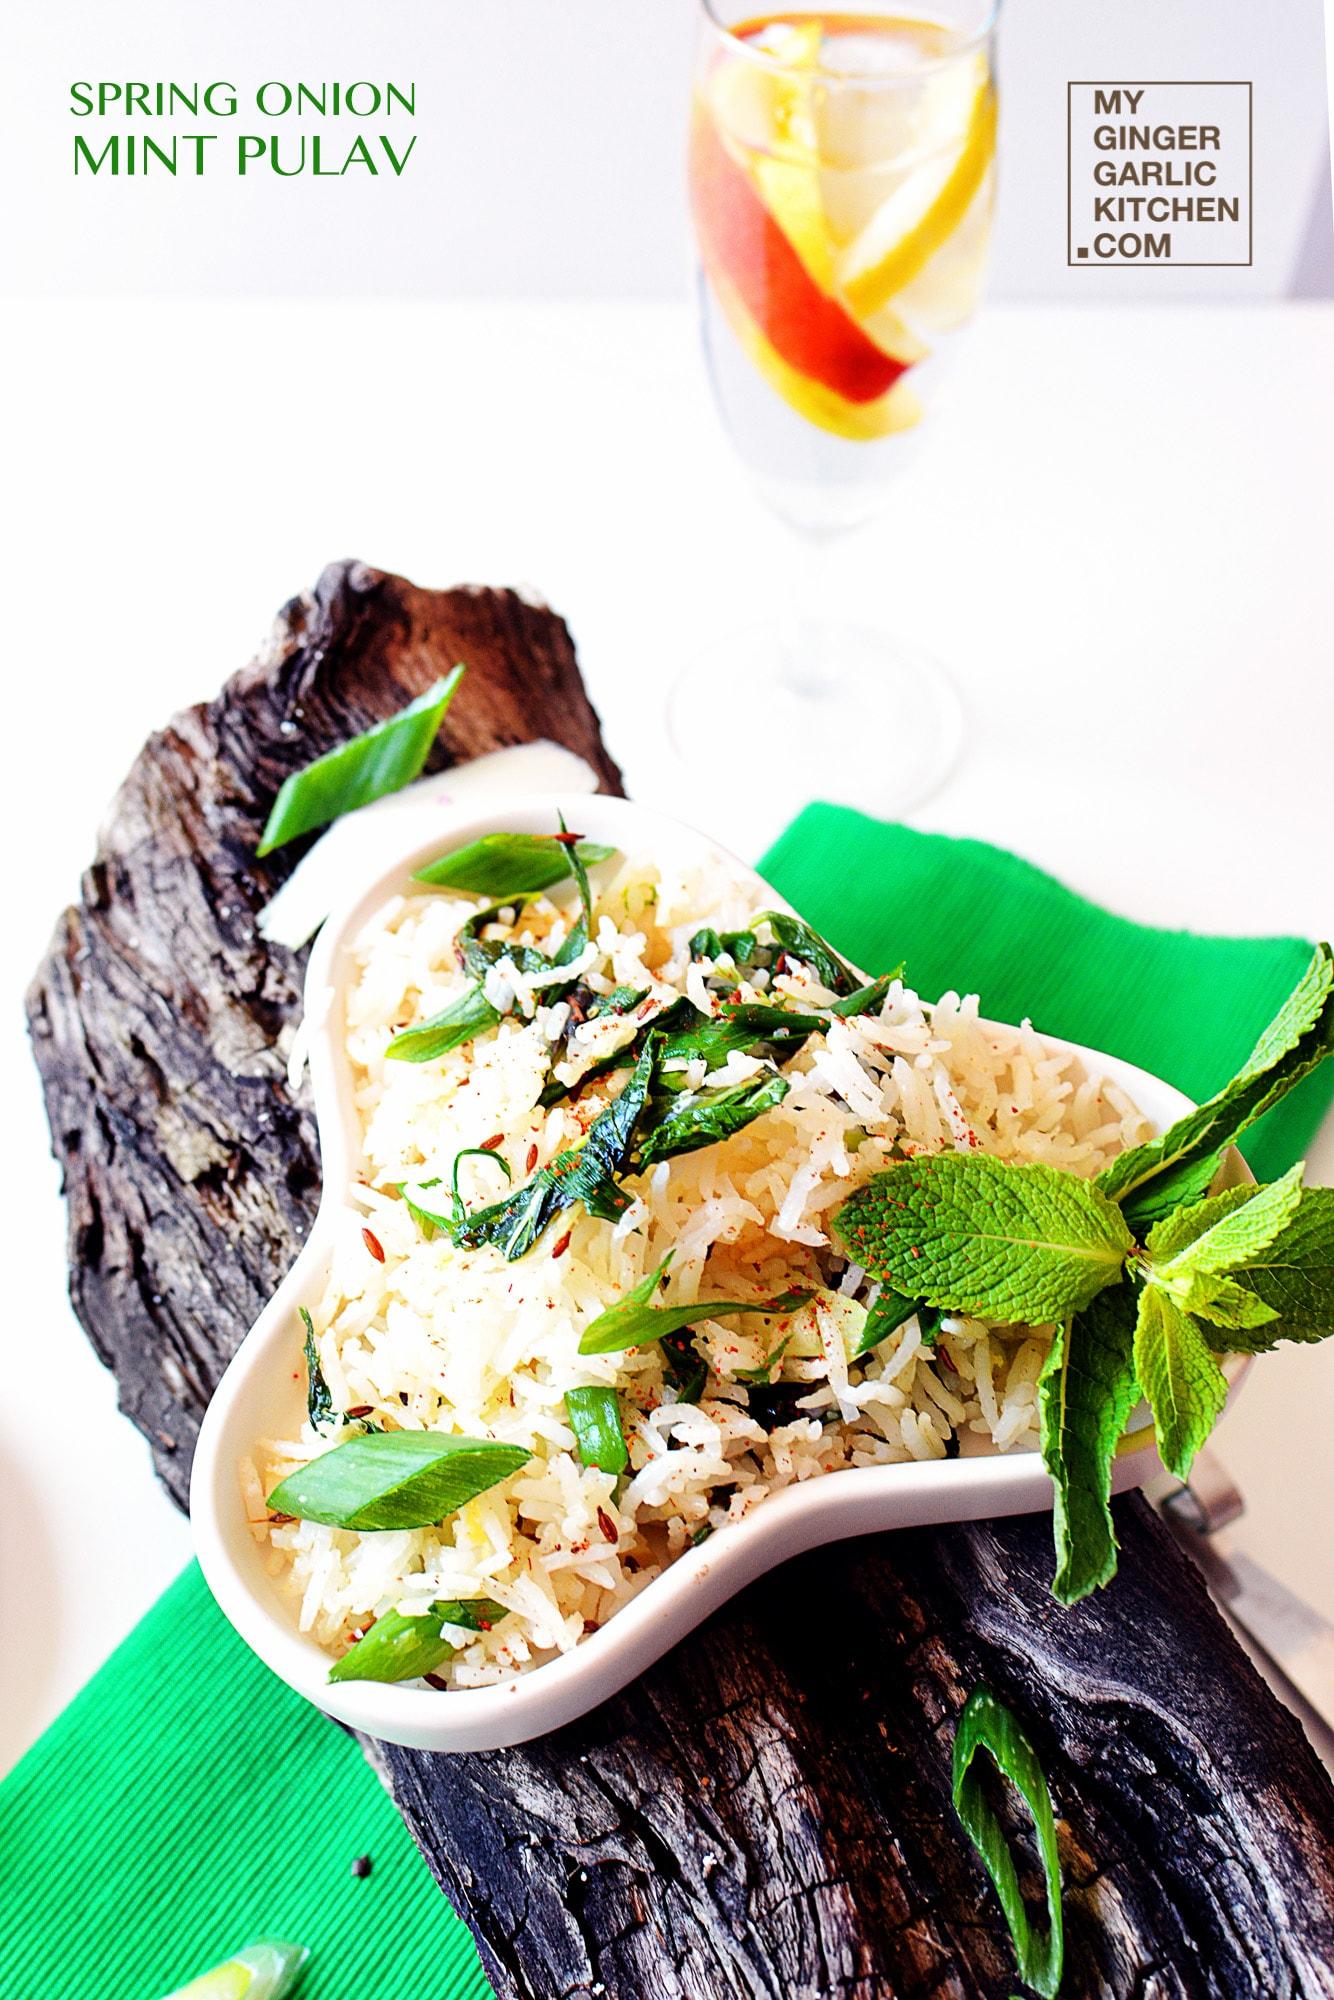 Image - recipe spring onion mint pulav anupama paliwal my ginger garlic kitchen 1